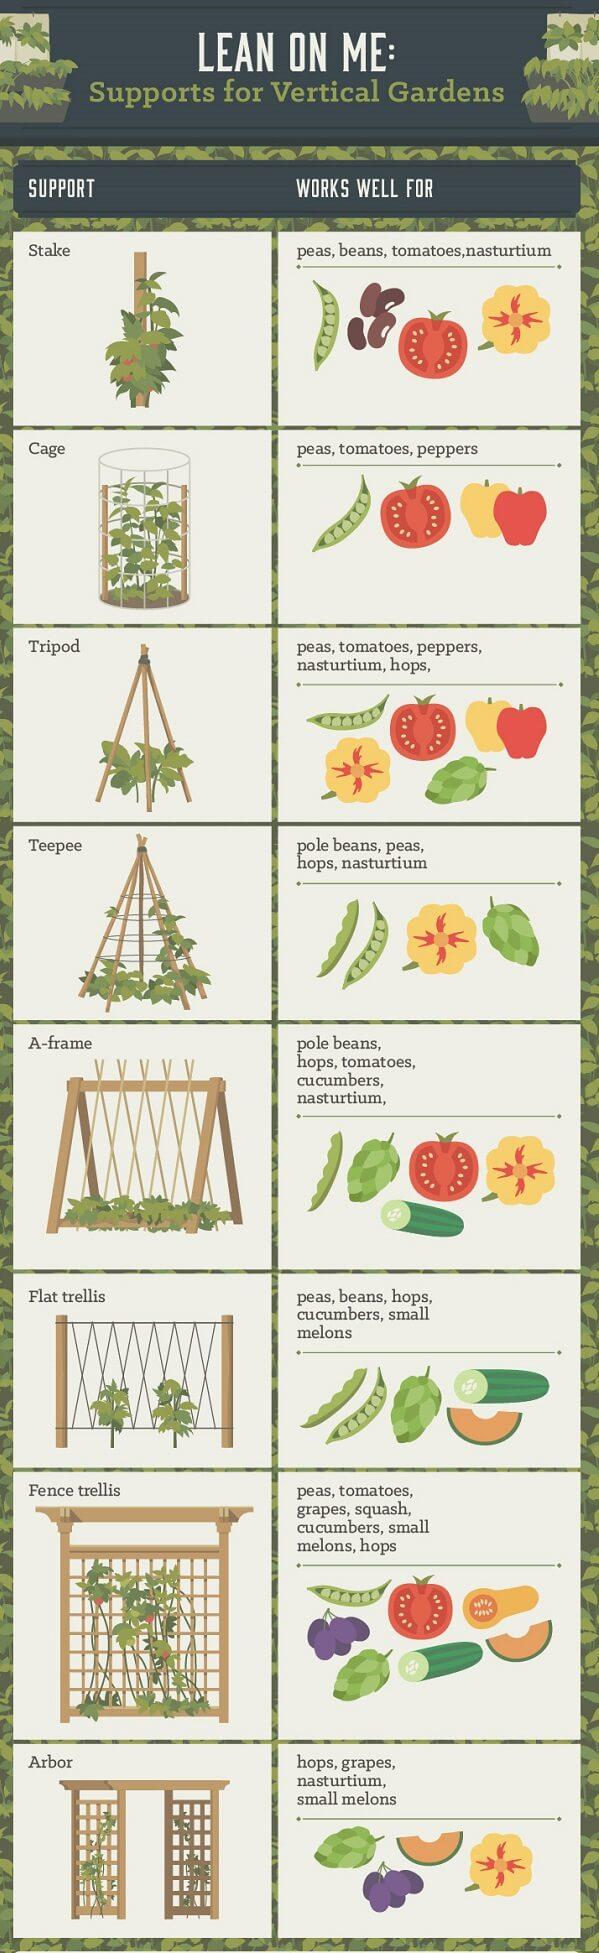 Vertical garden plant supports